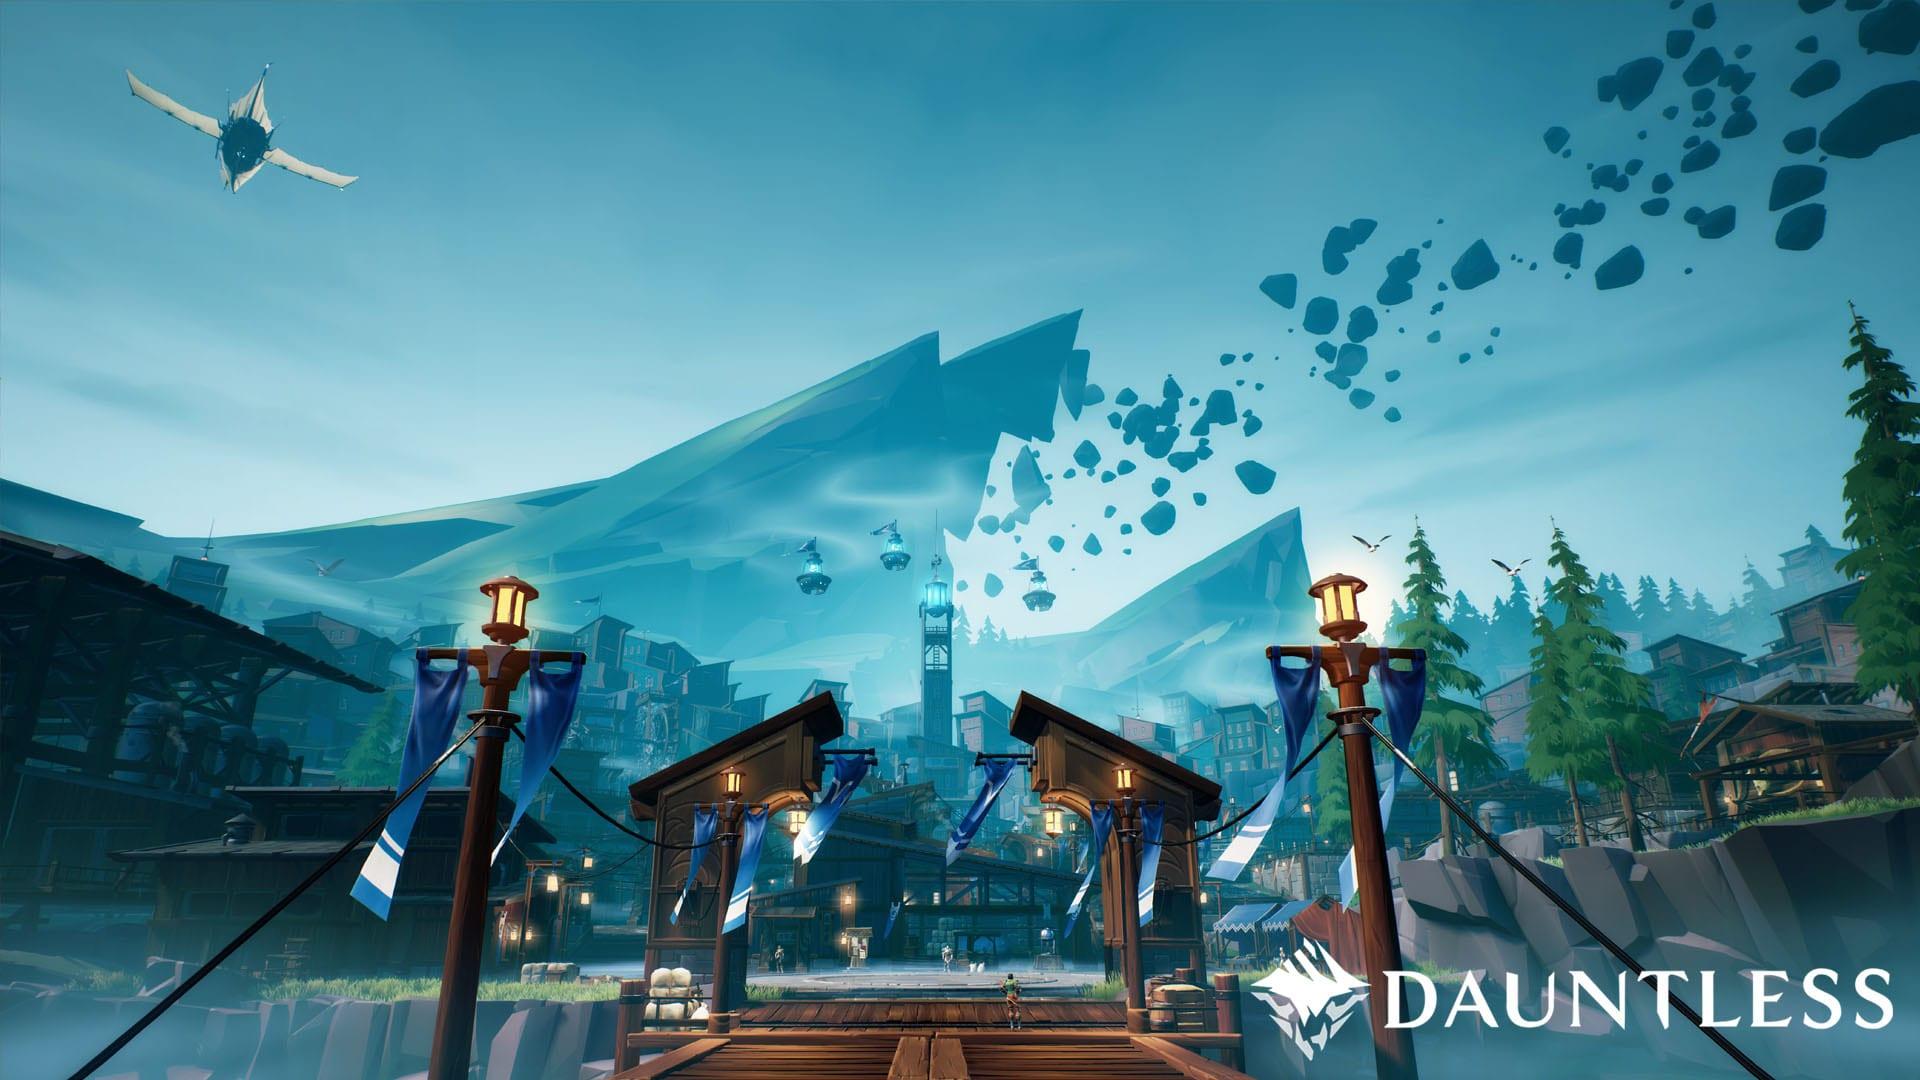 Dauntless Closed Beta Impressions - GameLuster